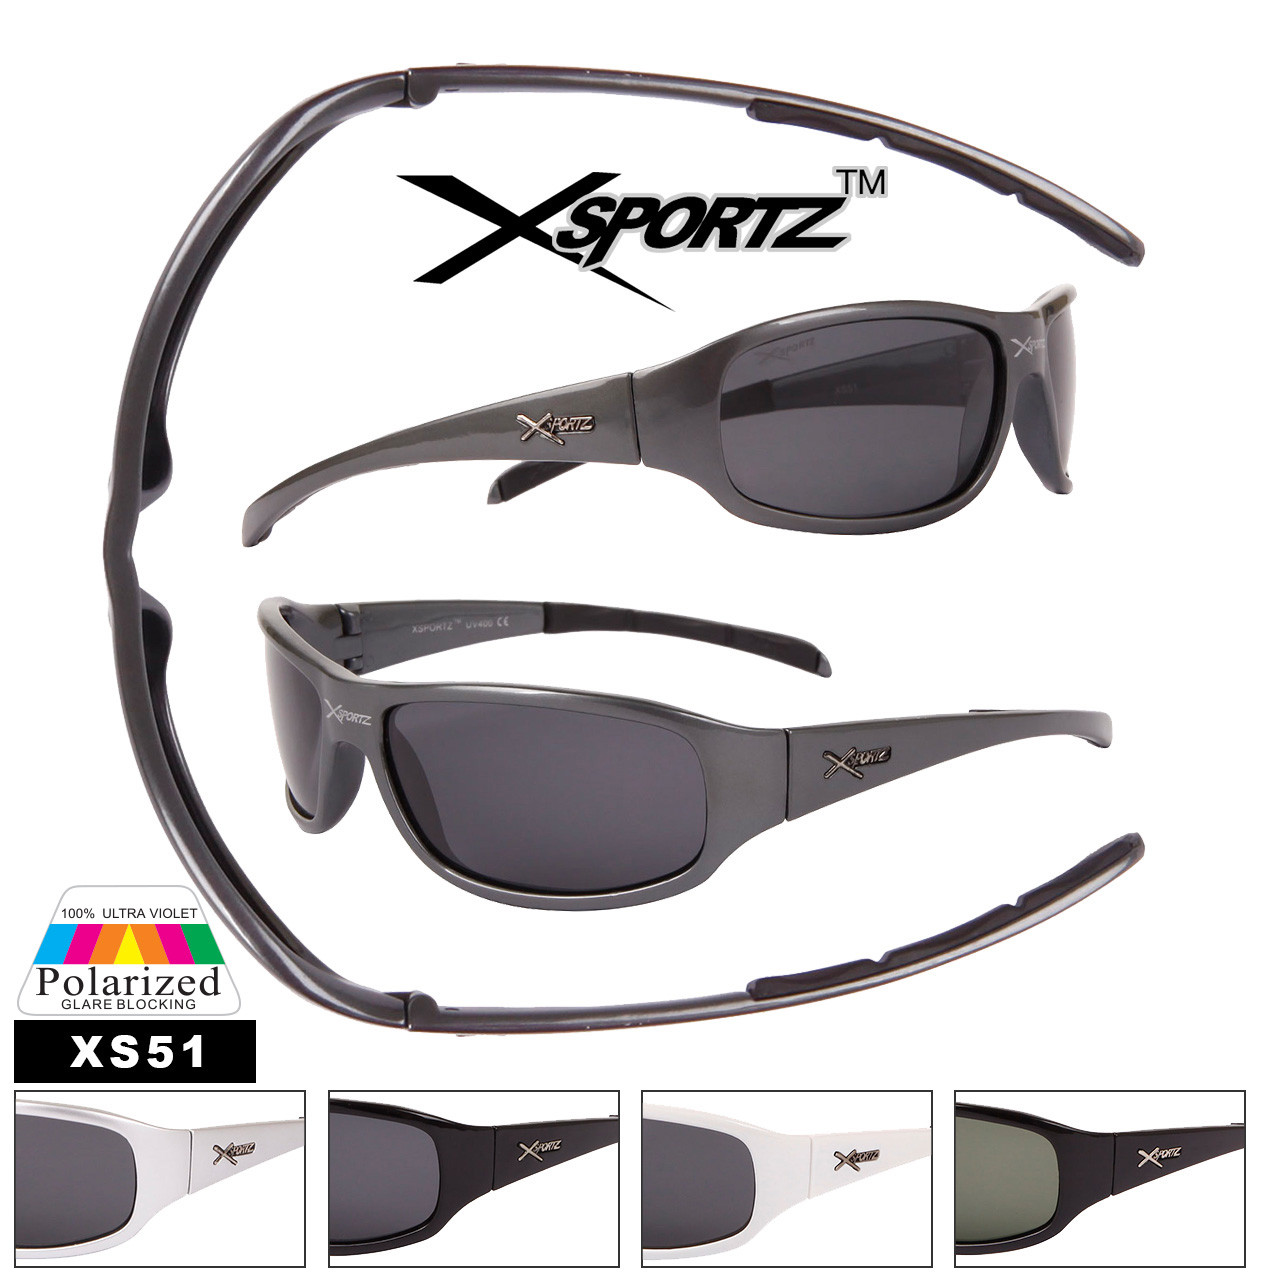 Xsportz™ Polarized Sports Sunglasses Wholesale - Style #XS51 (Assorted Colors) (12 pcs.)